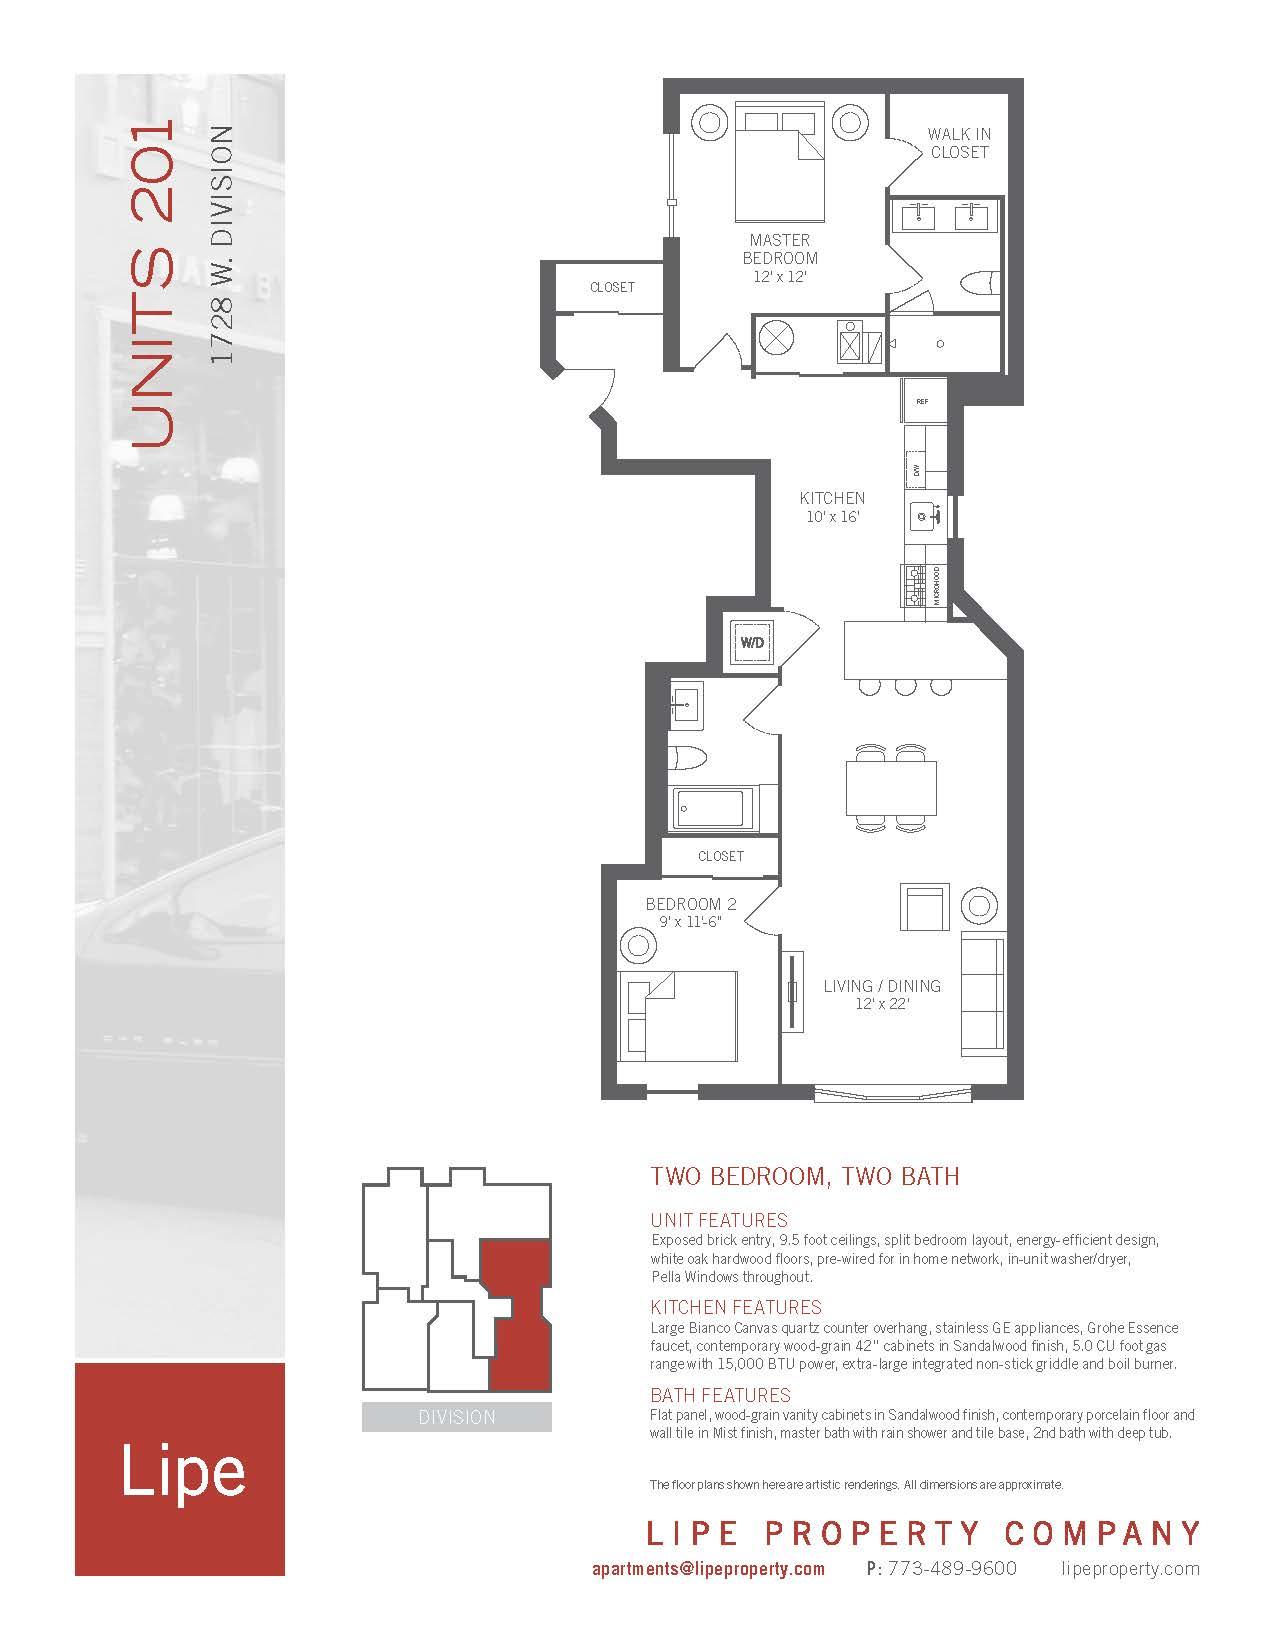 1728-West-Division-201-Floorplan-Chicago-apartment-for-rent.jpg